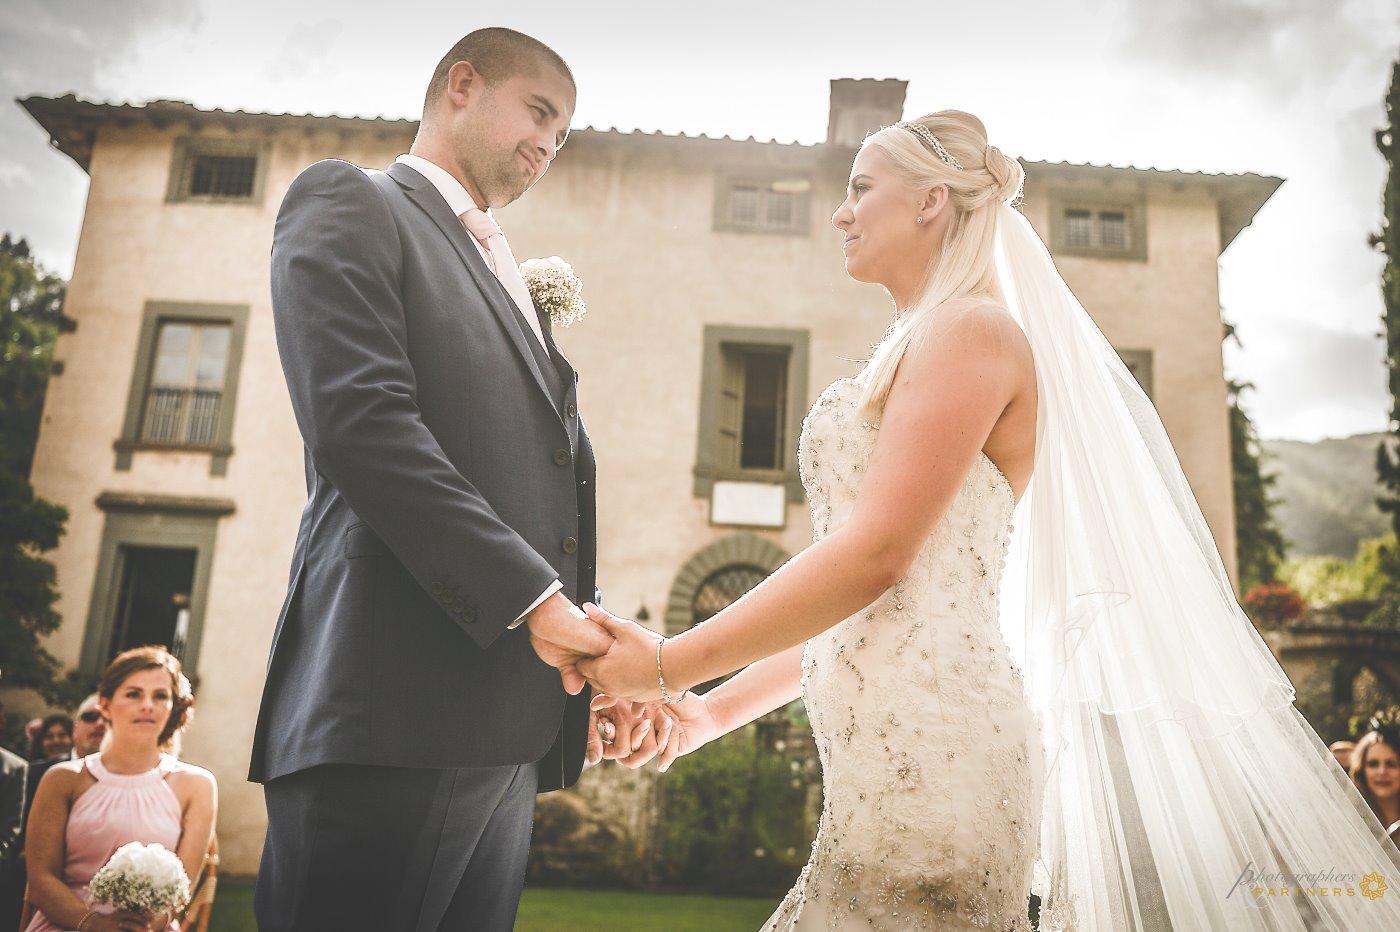 photography_weddings_catureglio_10.jpg